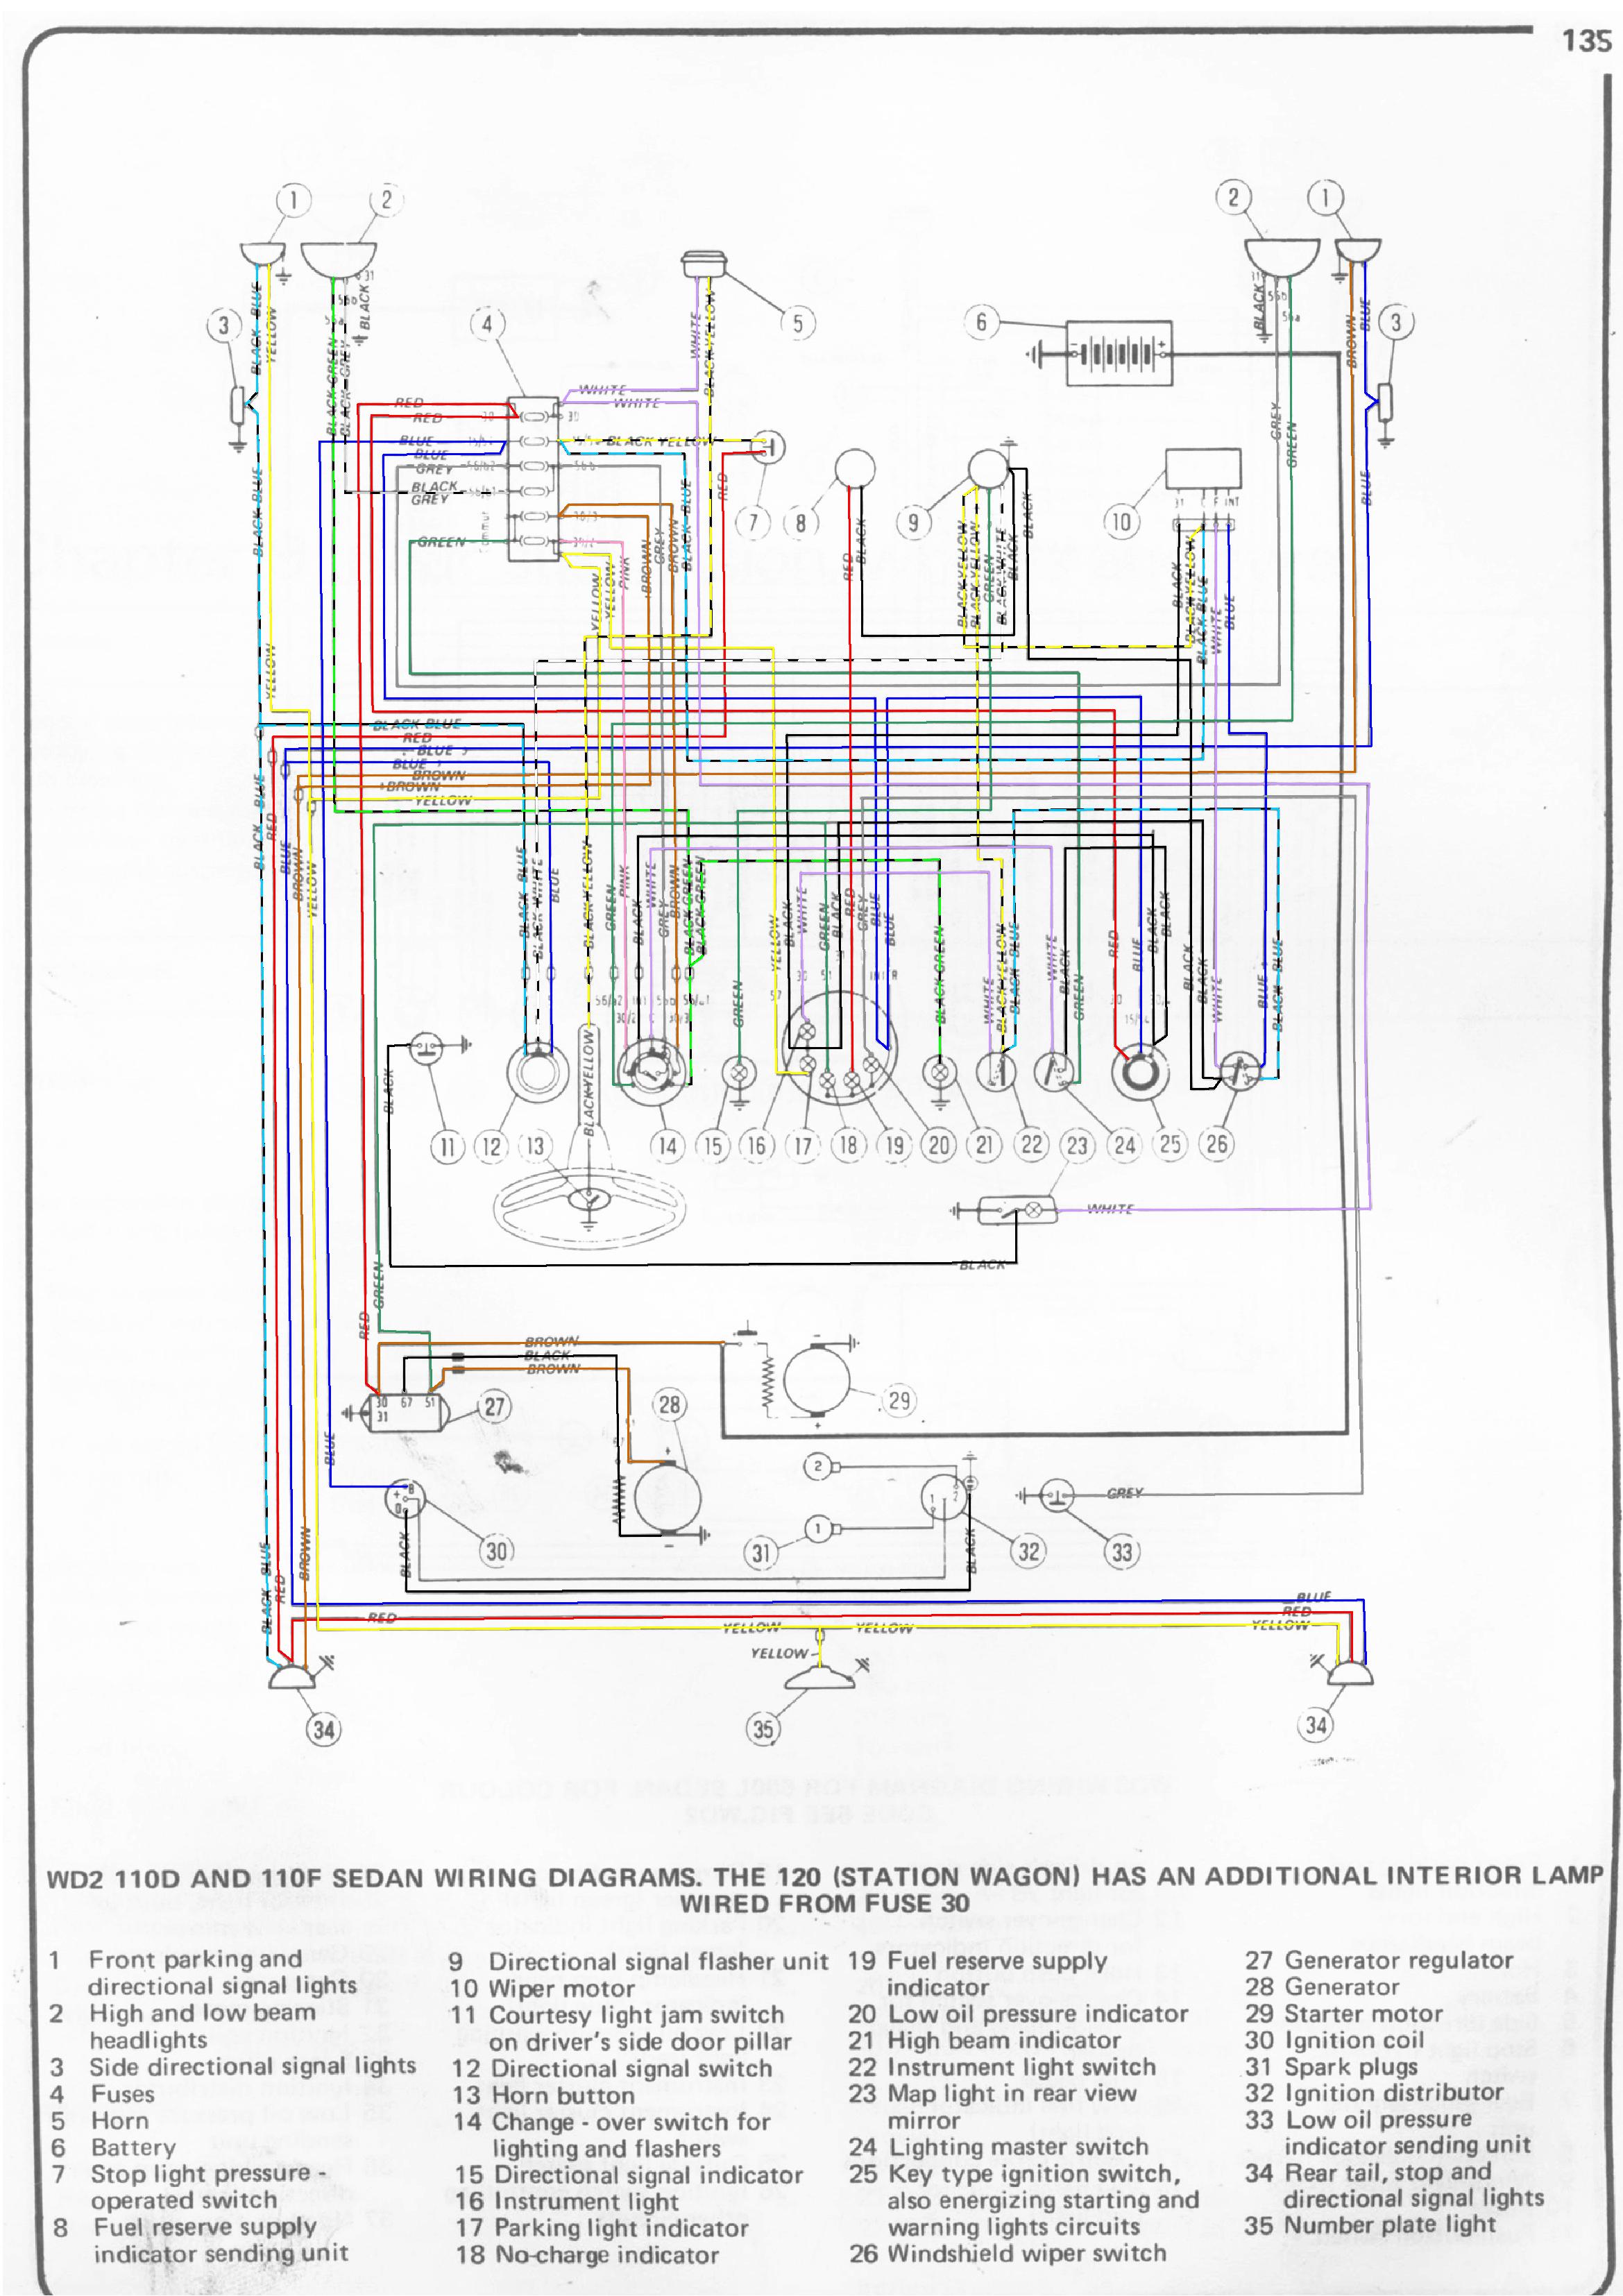 fiat tipo wiring diagram wiring diagram rh blacz de Kawasaki Wiring Diagrams Fiat 500 Wiring Diagram